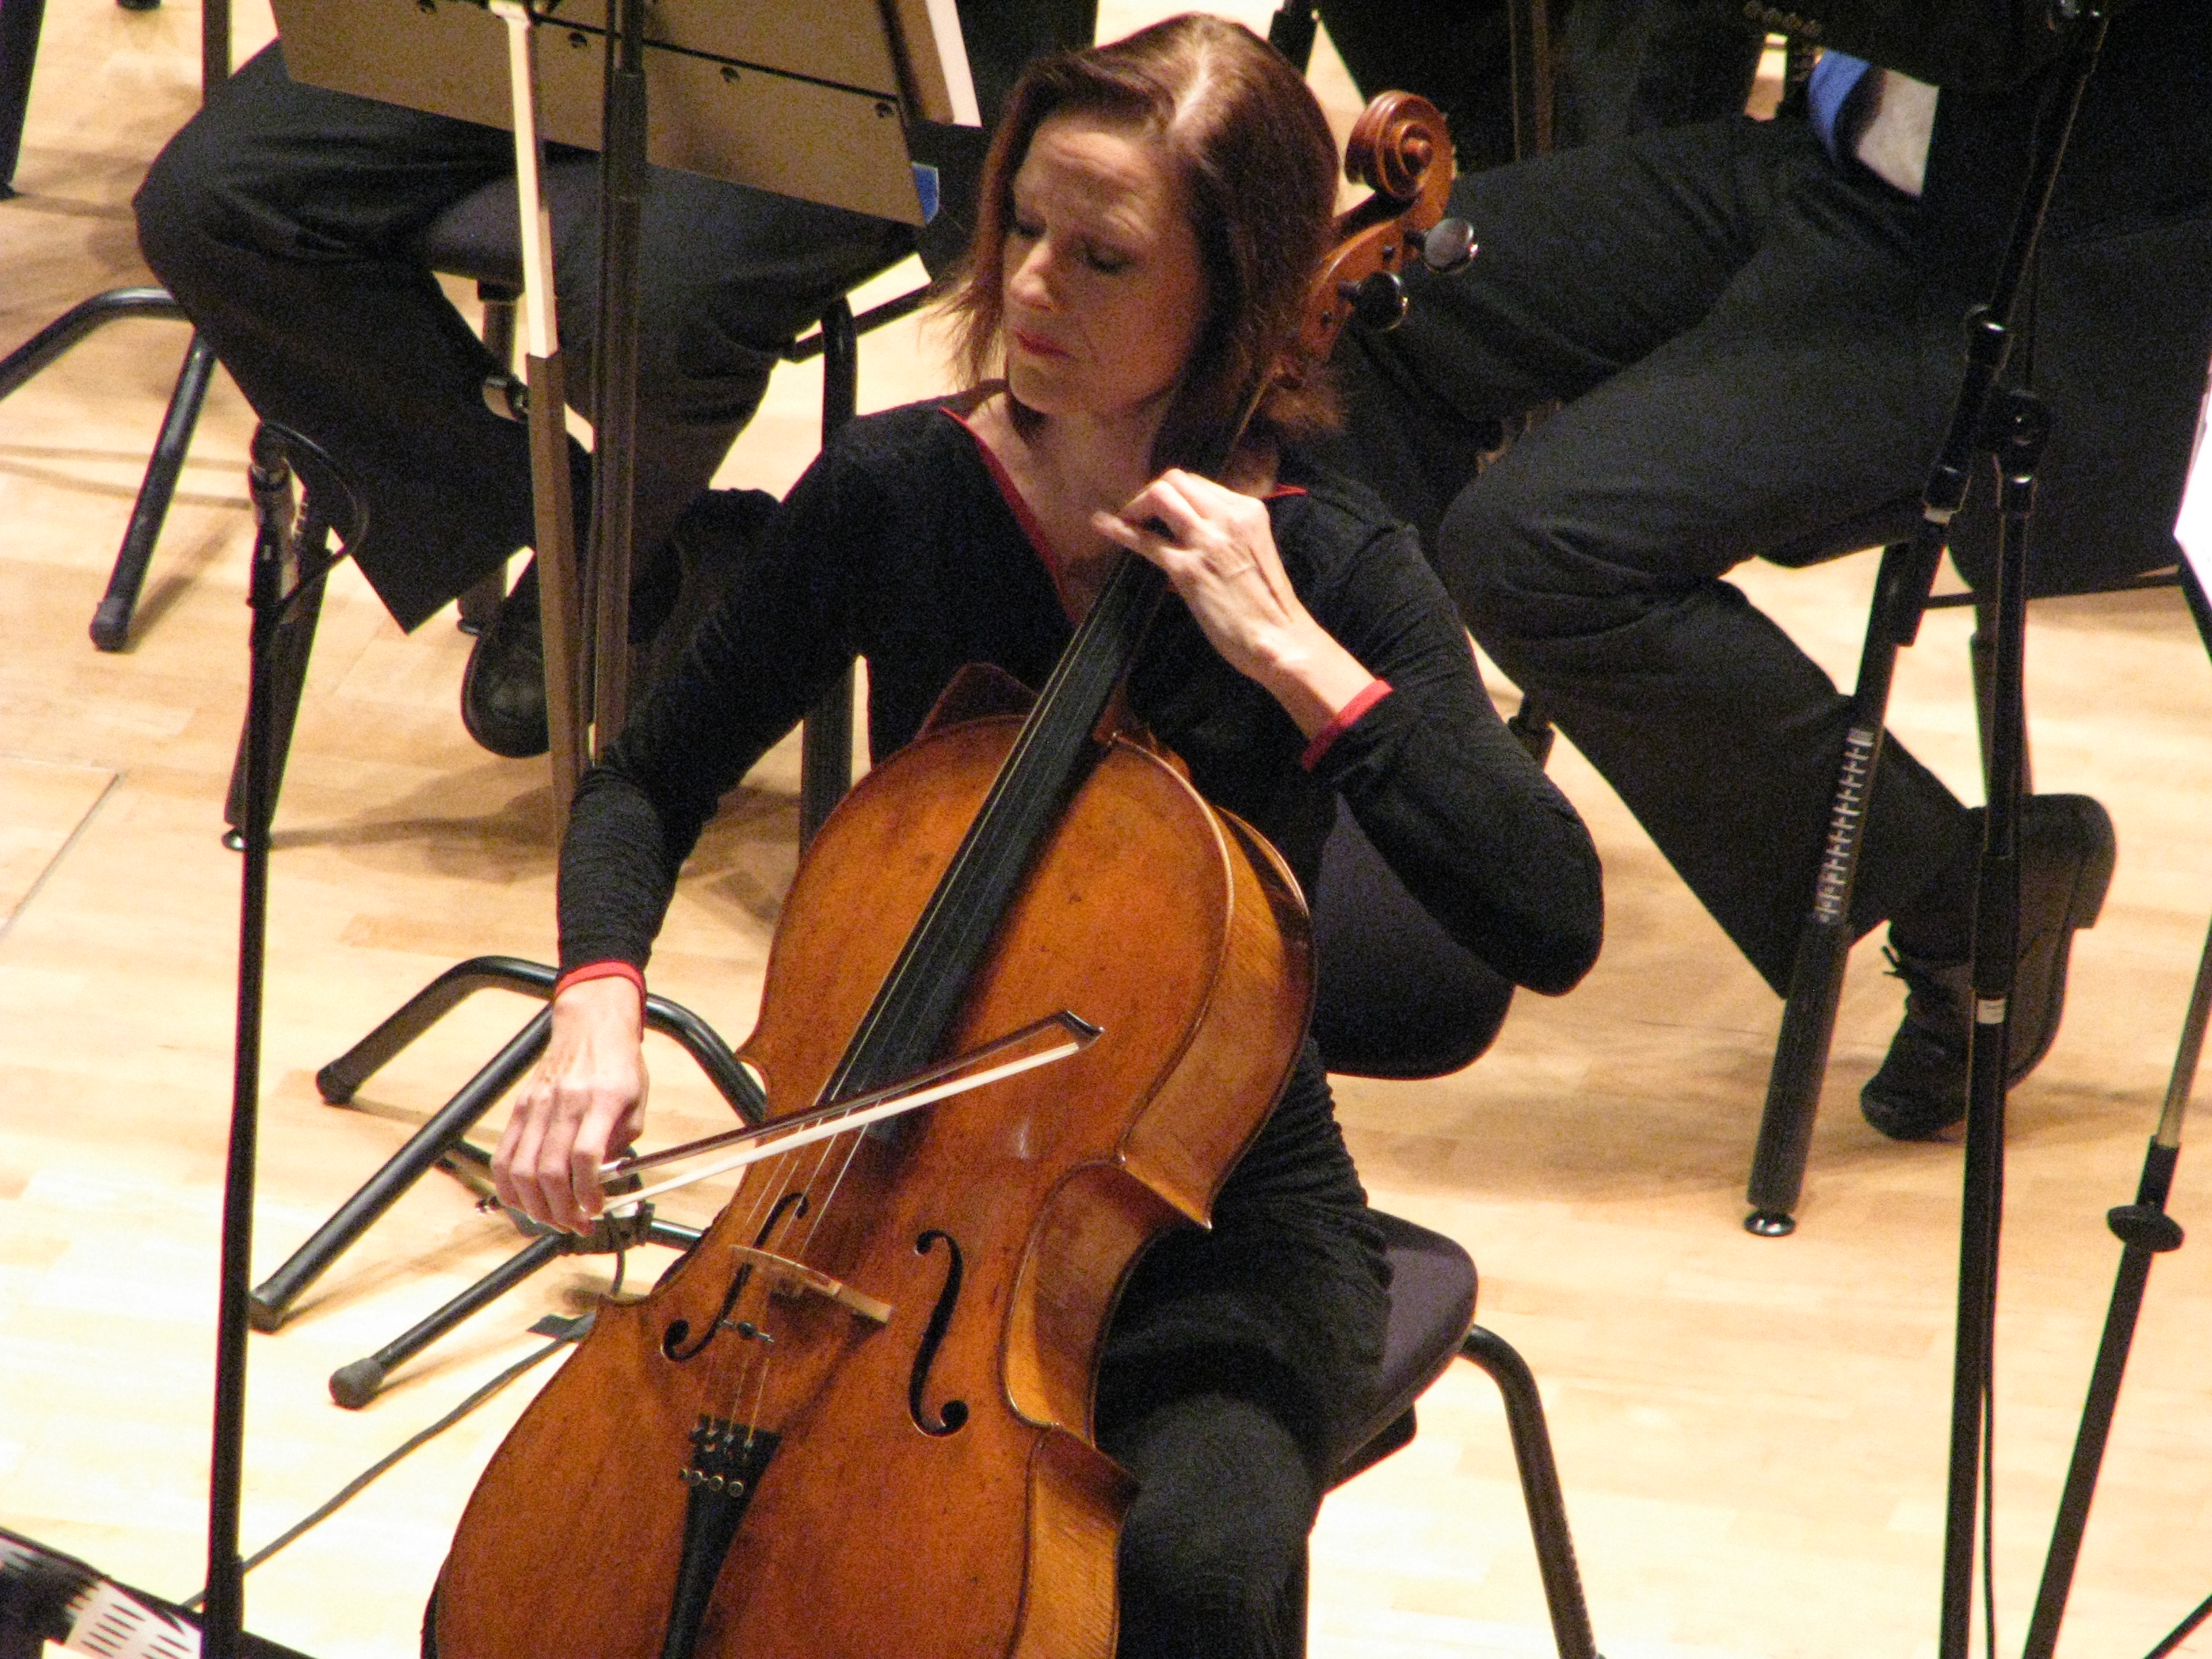 Anja lechner - umeå jf 2013